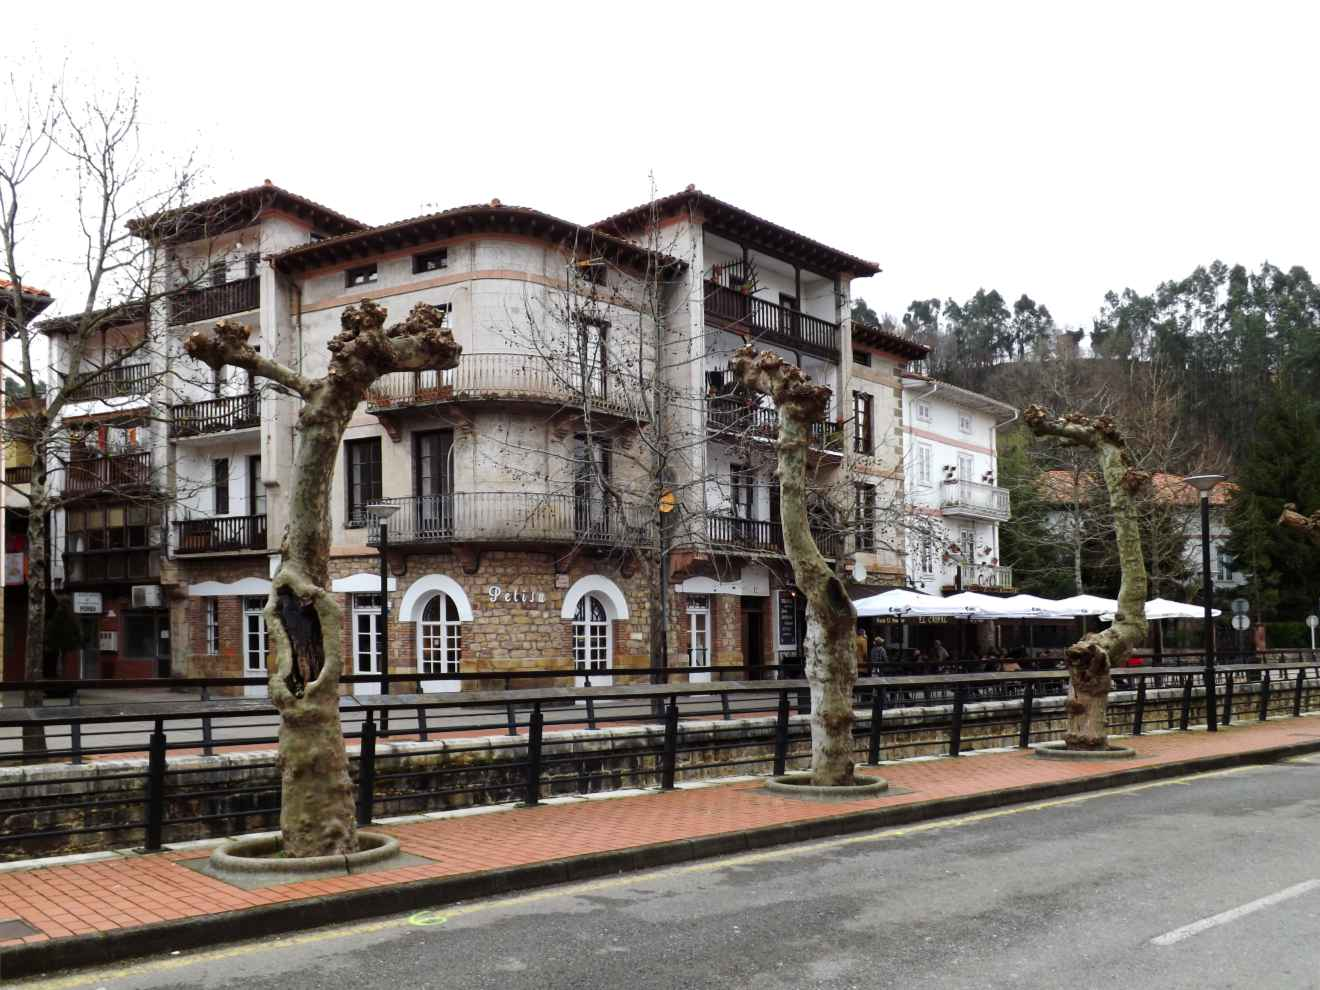 Casa en el centro de Cabezón